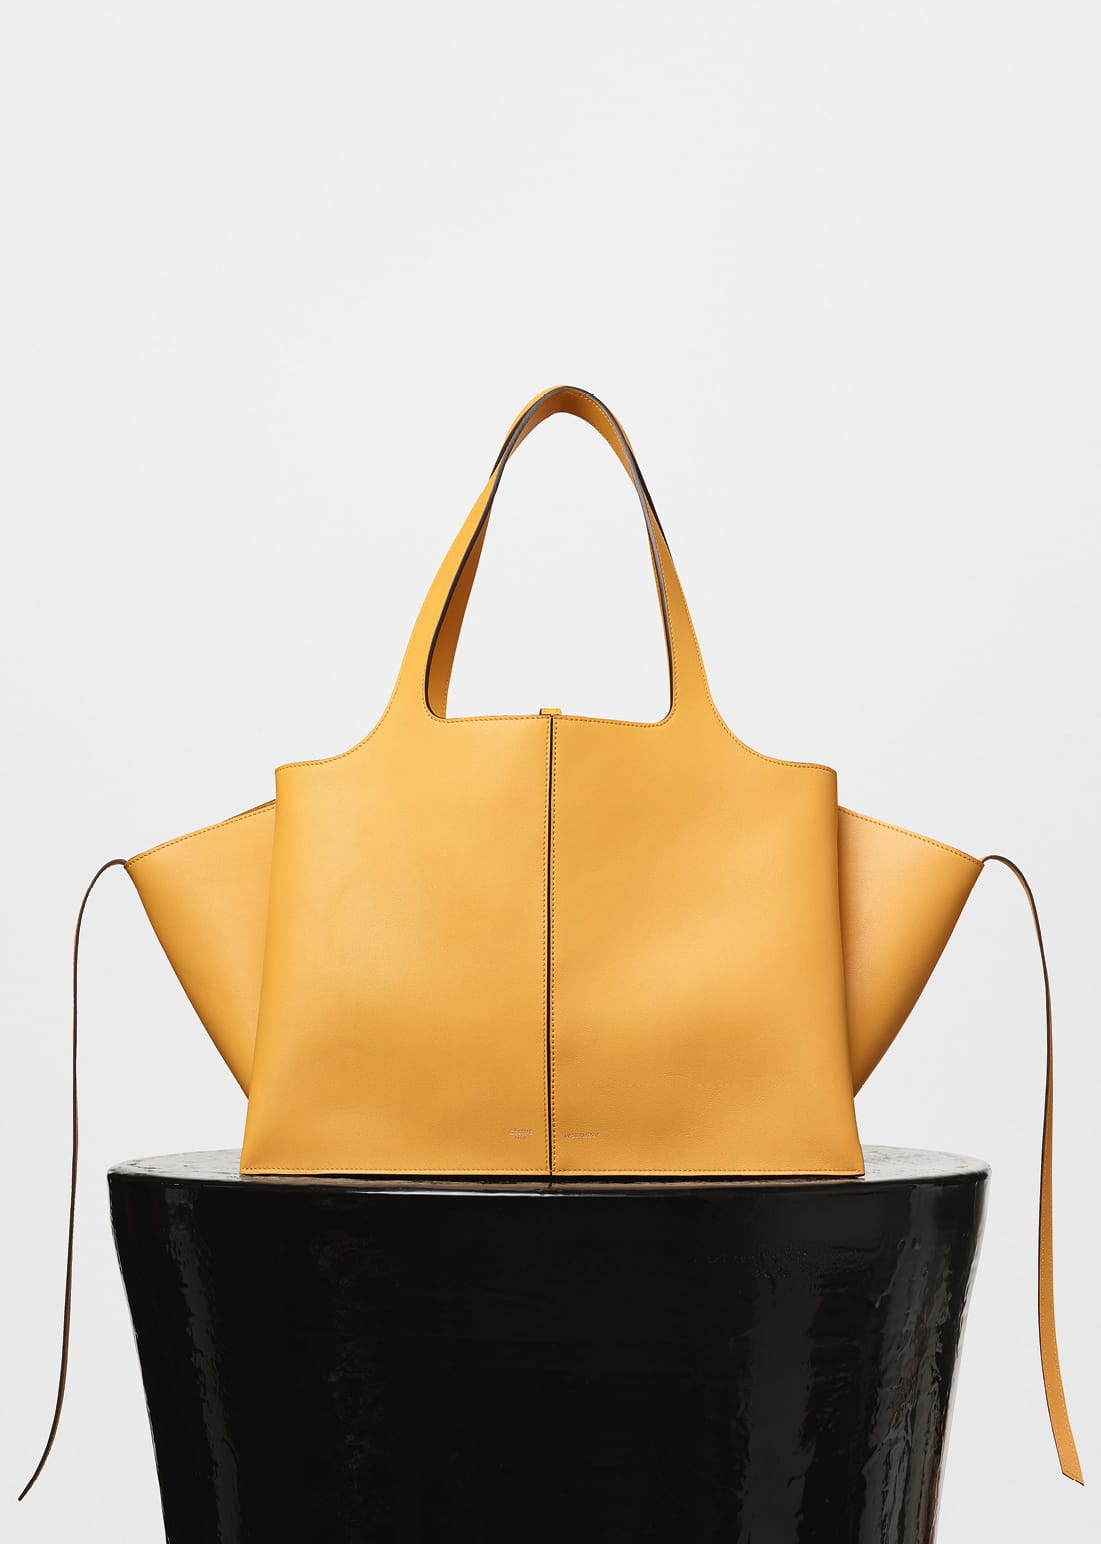 85ffca7b95af Discover Céline s New Must-Have  Tri-Fold  Bag - Savoir Flair